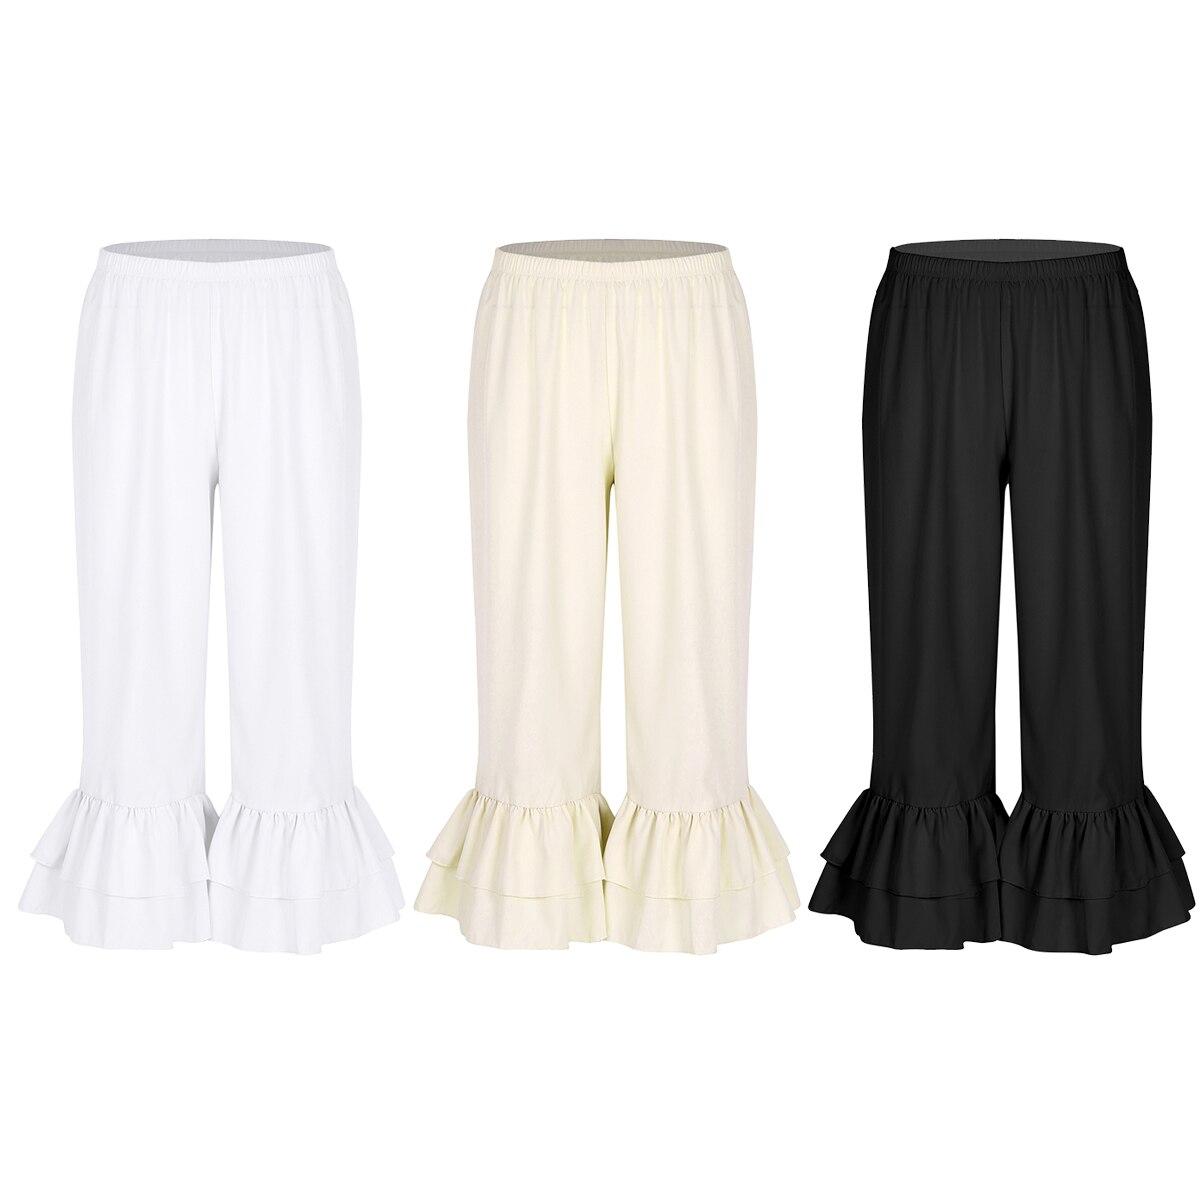 Women Ladies Sweet Dance Trousers Retro Vintage Elastic Waist Ruffles Hem Pantaloons Bloomers Underpants Victorian Era Costume